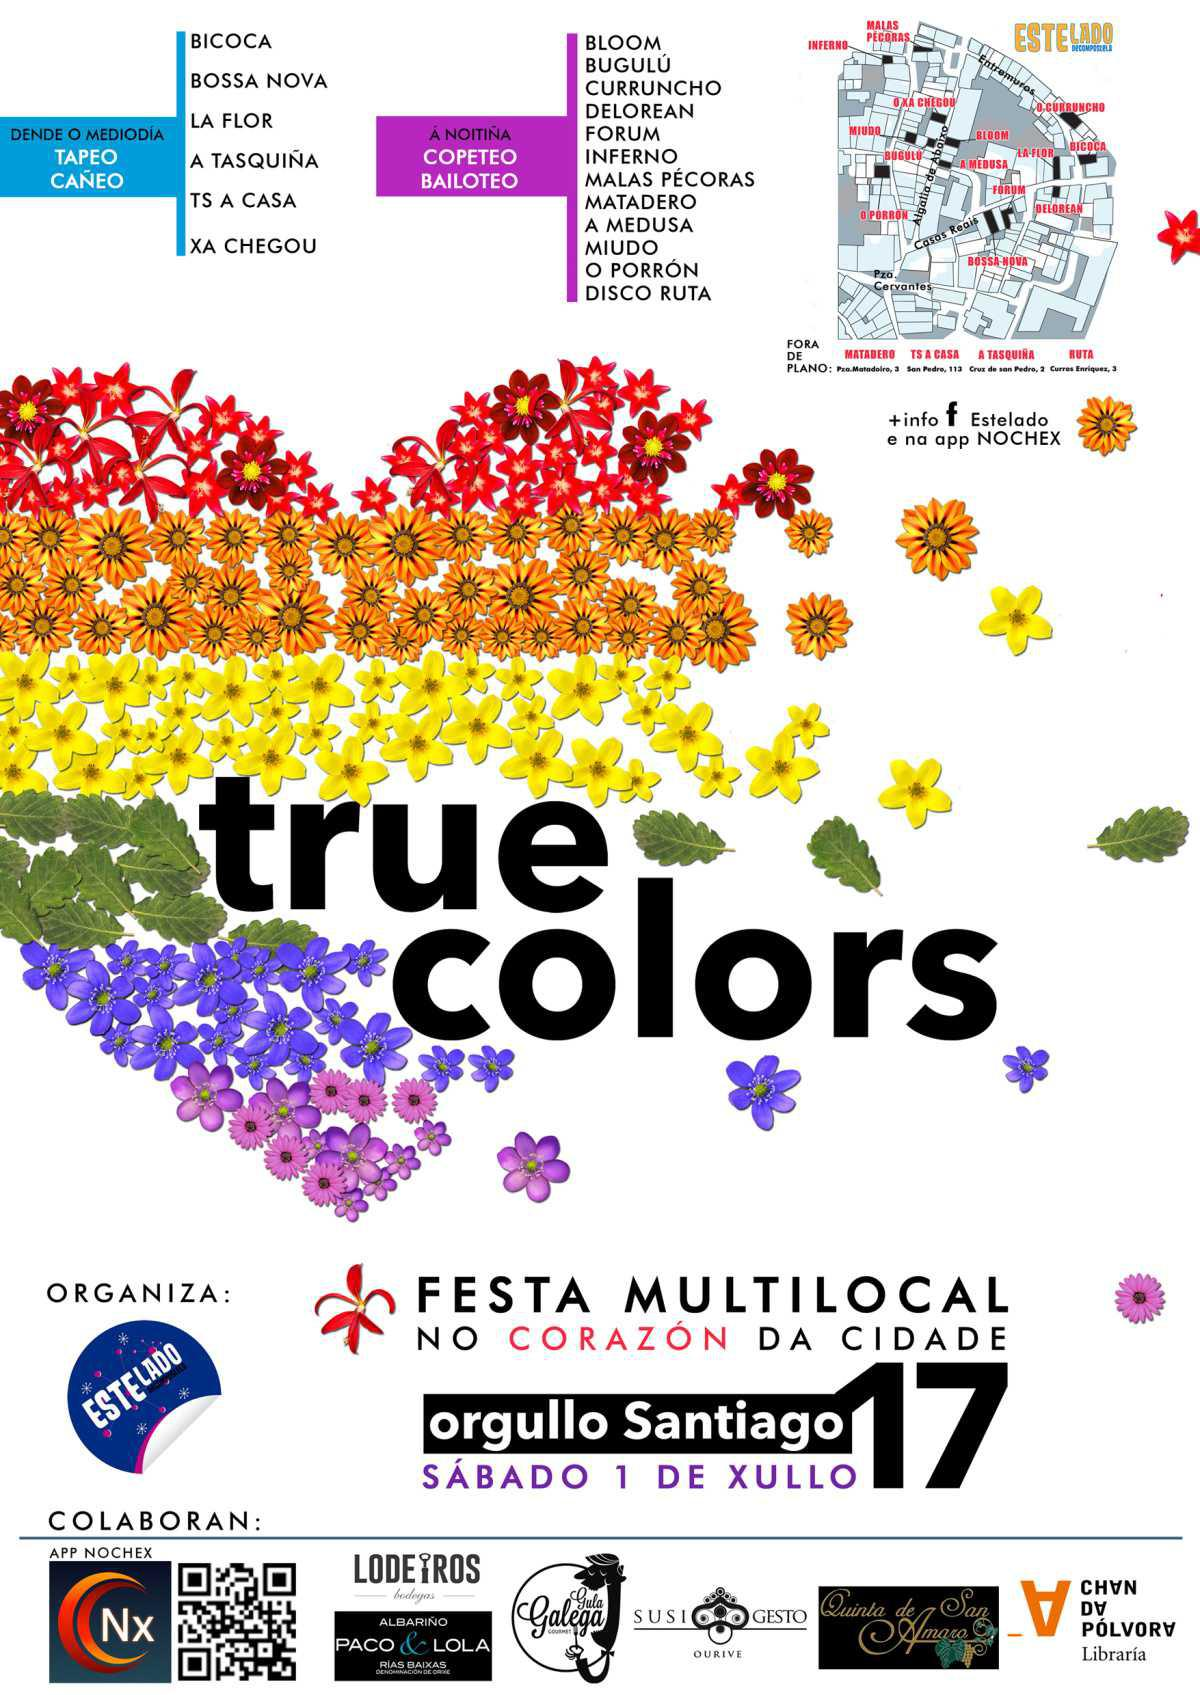 True Colors, Fiesta del Orgullo en Santiago de Compostela